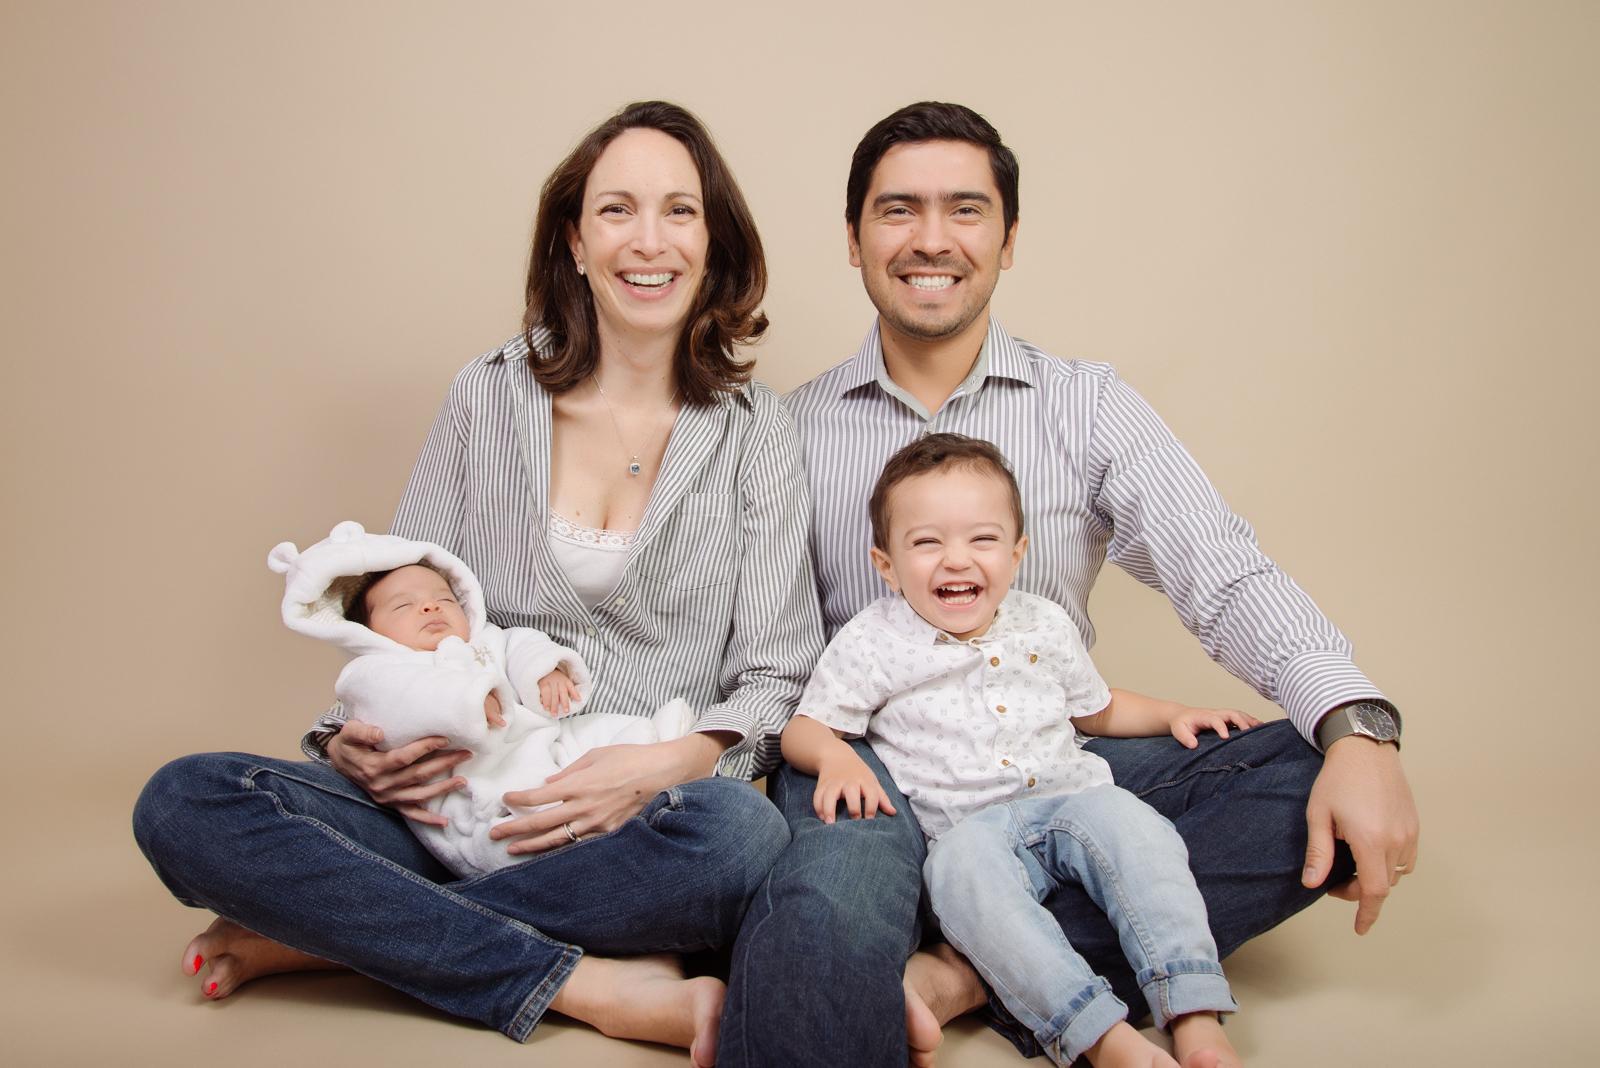 NewBorn Luciana y Familia (1 of 5)